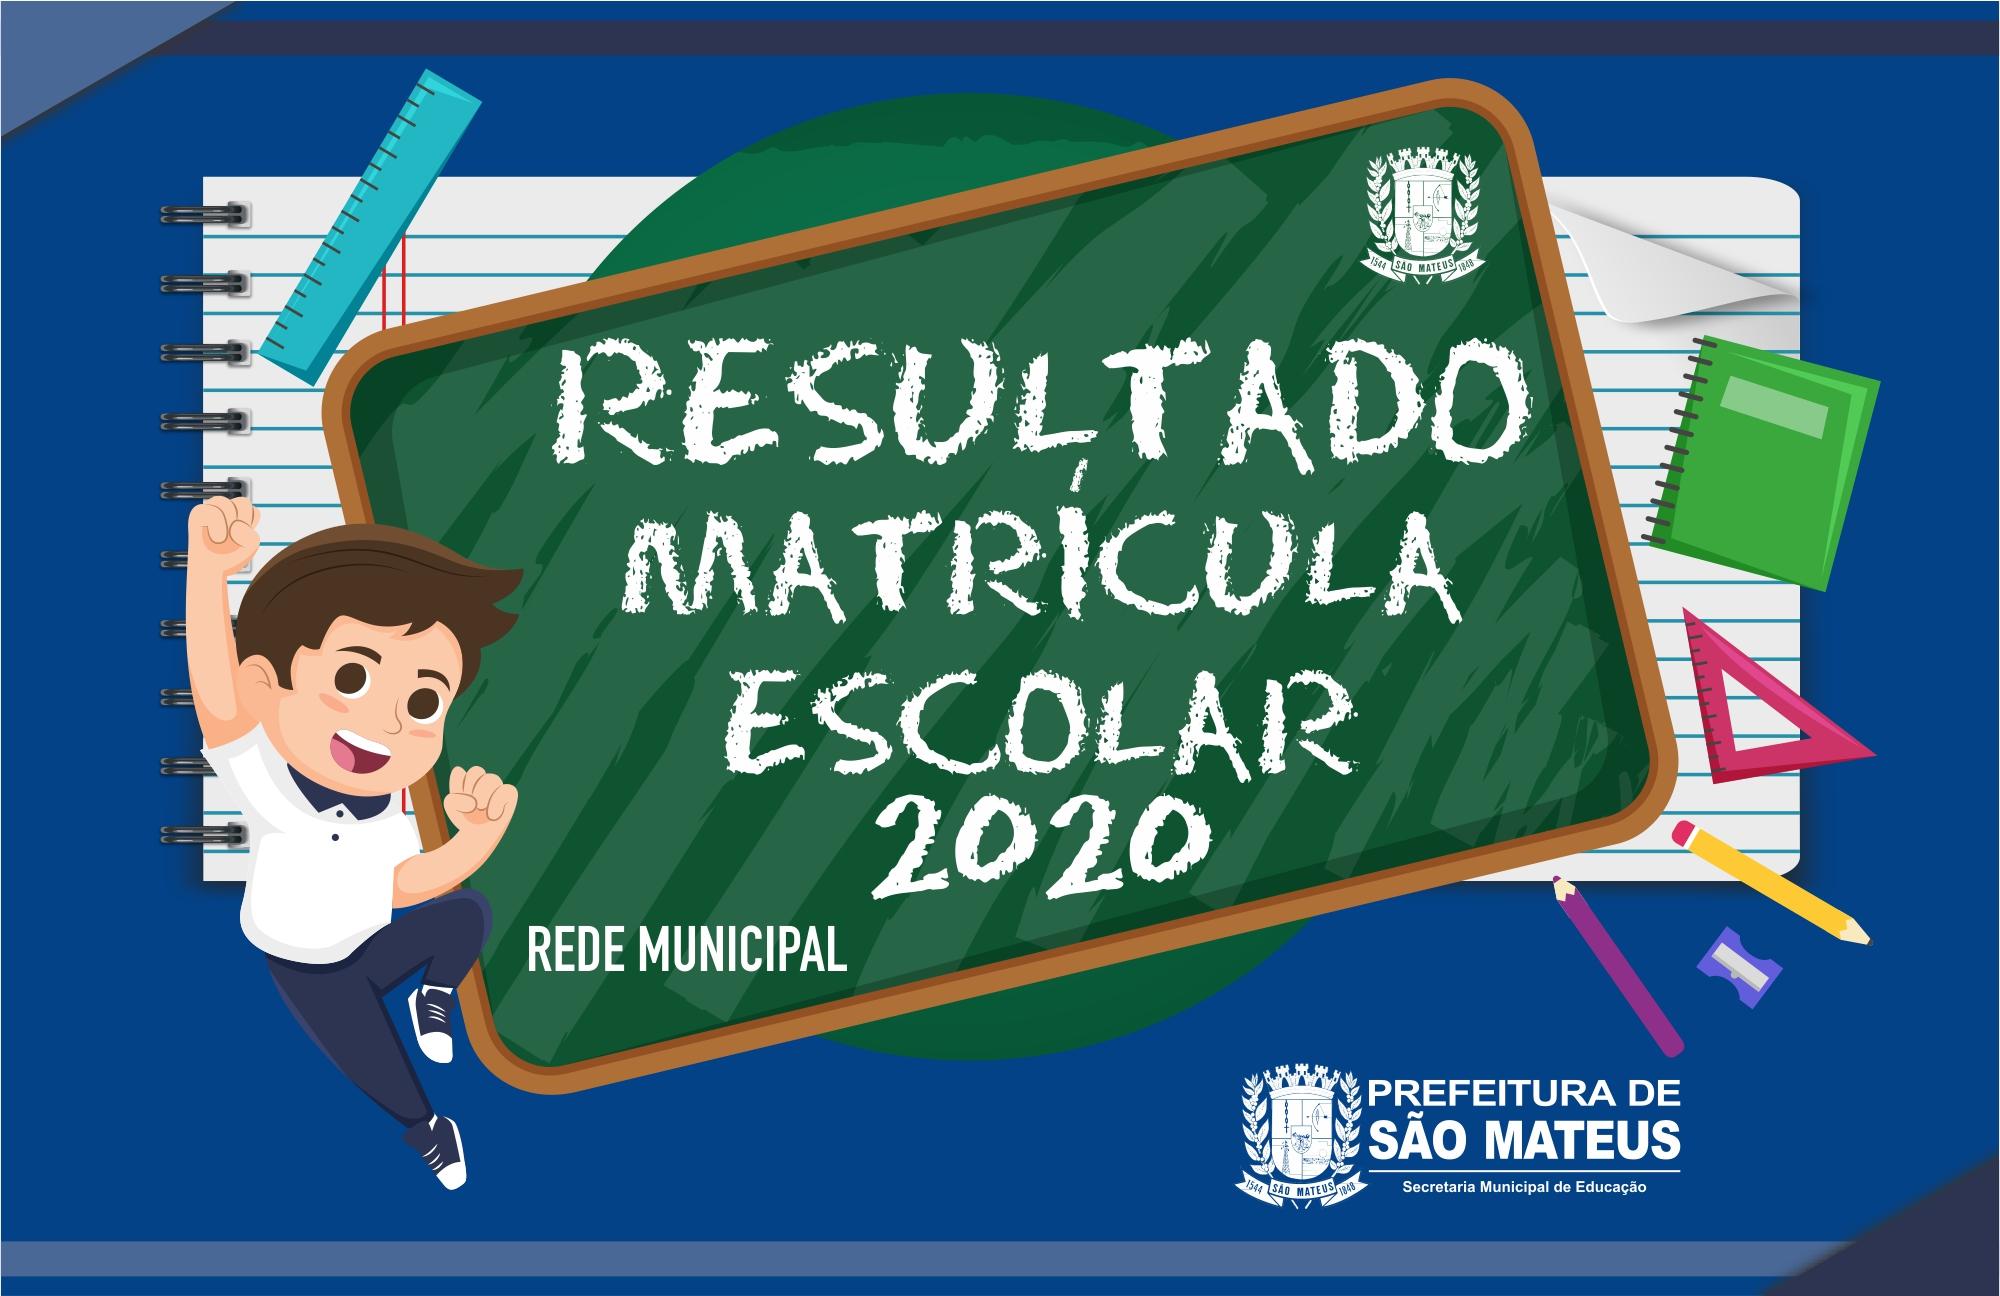 RESULTADO MATRÍCULA ESCOLAR 2020